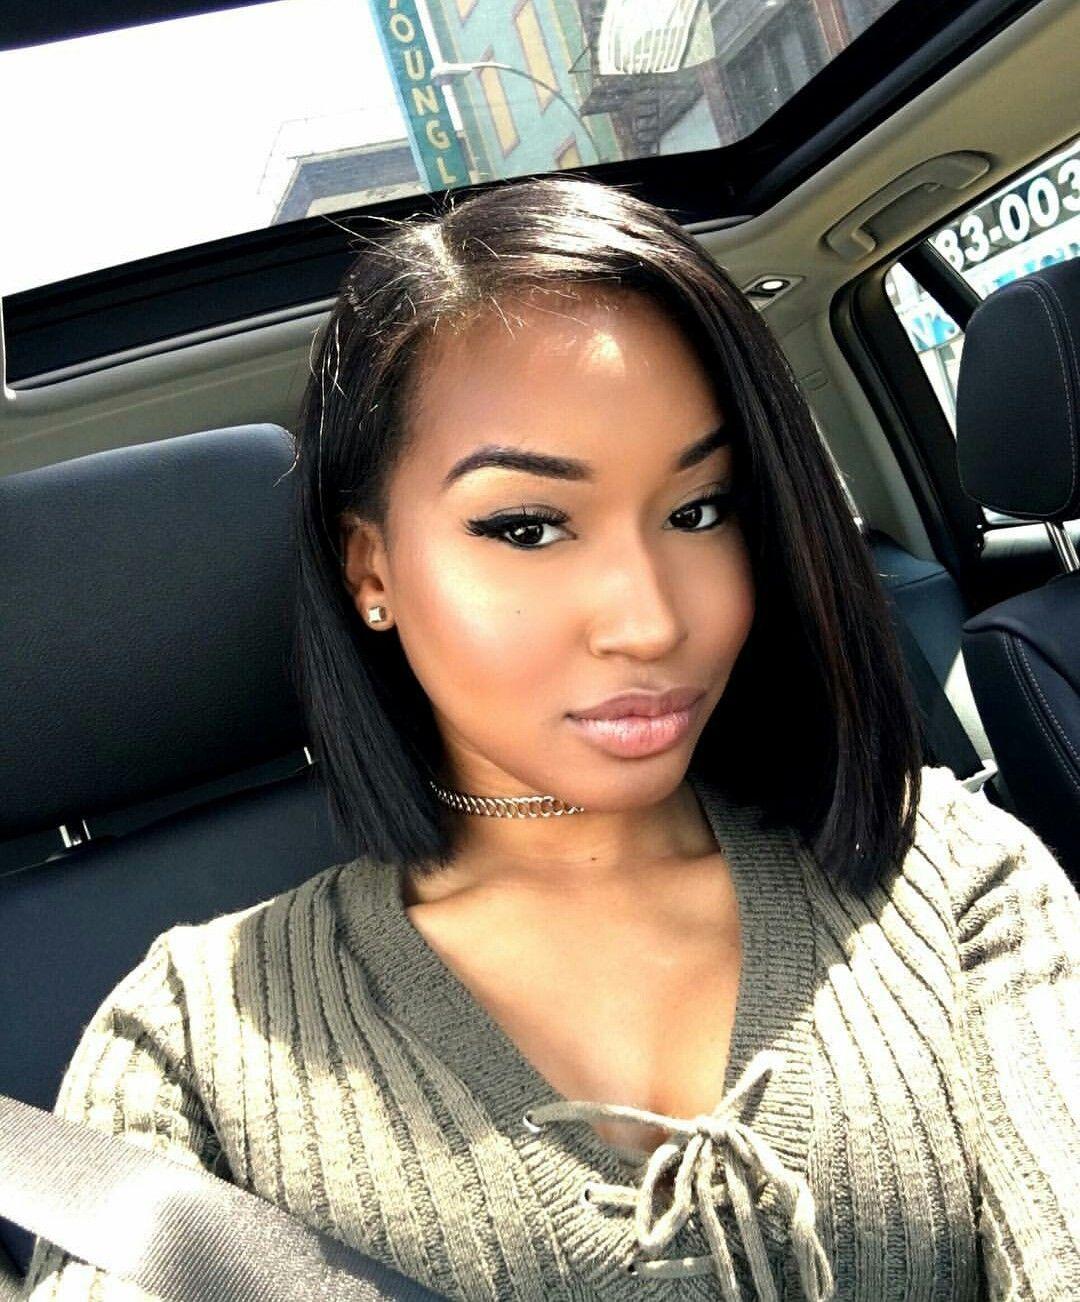 ✨ go follow @blackgirlsvault for more celebration of black beauty